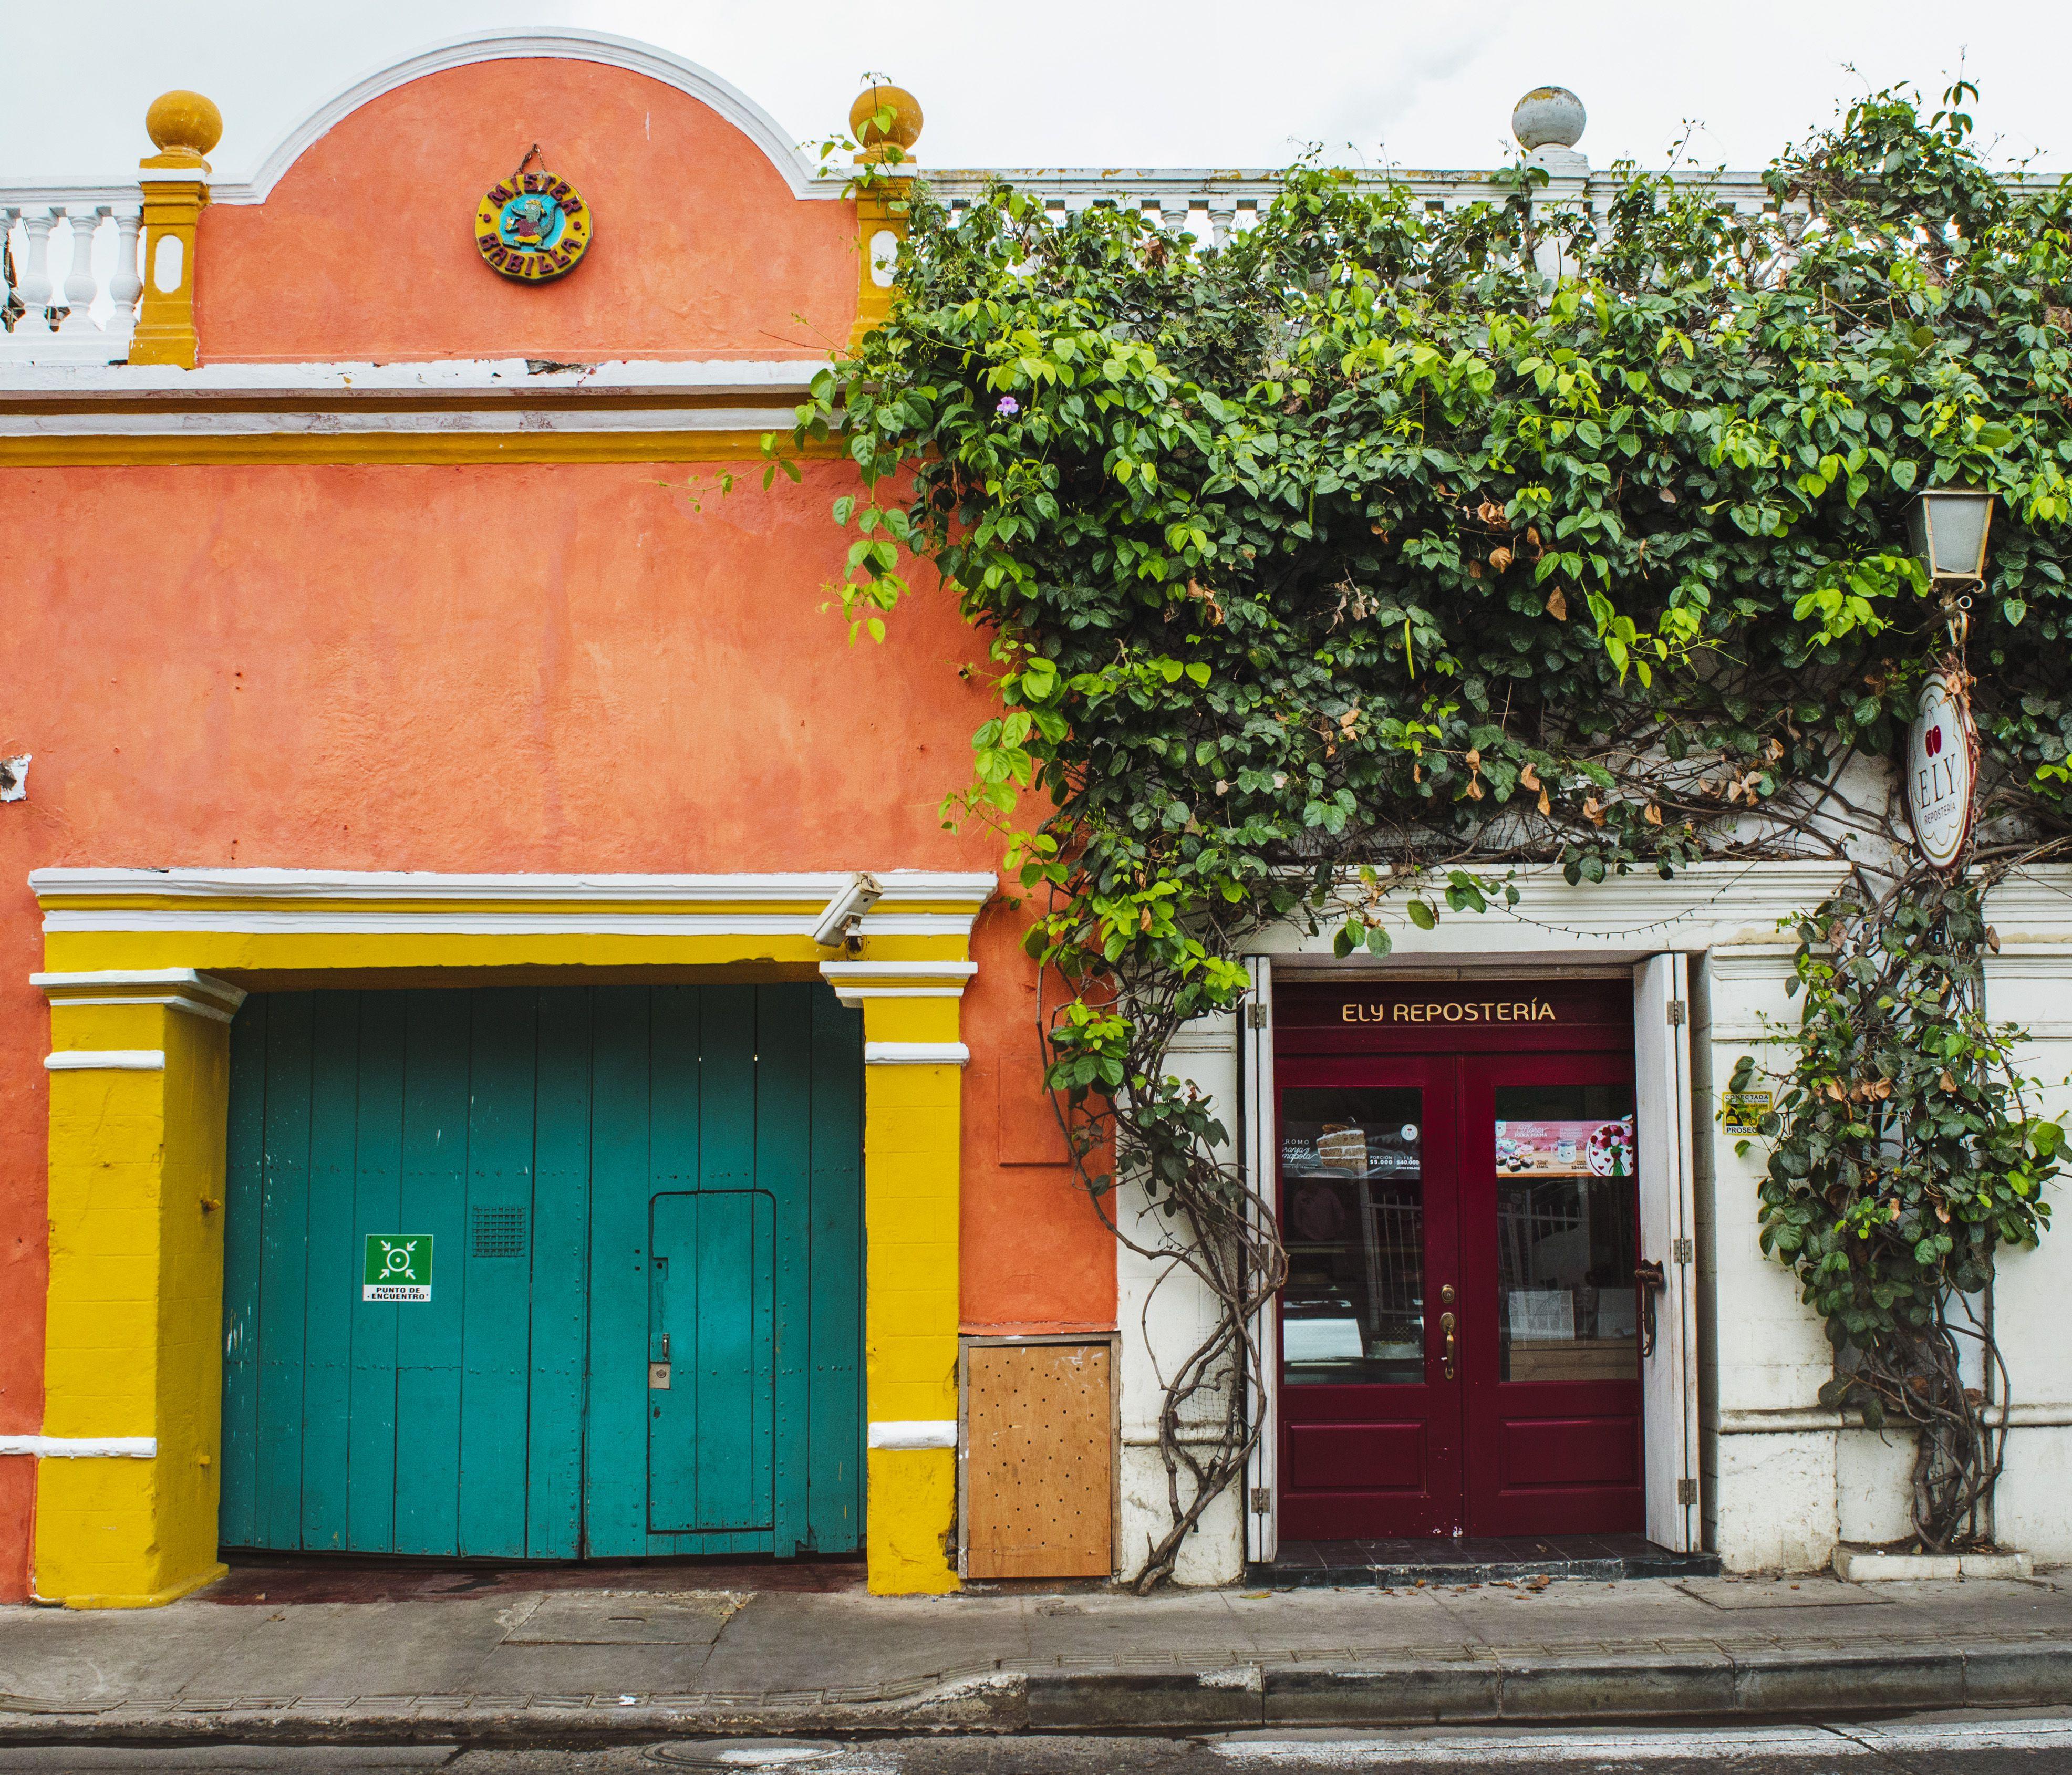 Colorful buildings in Cartagena